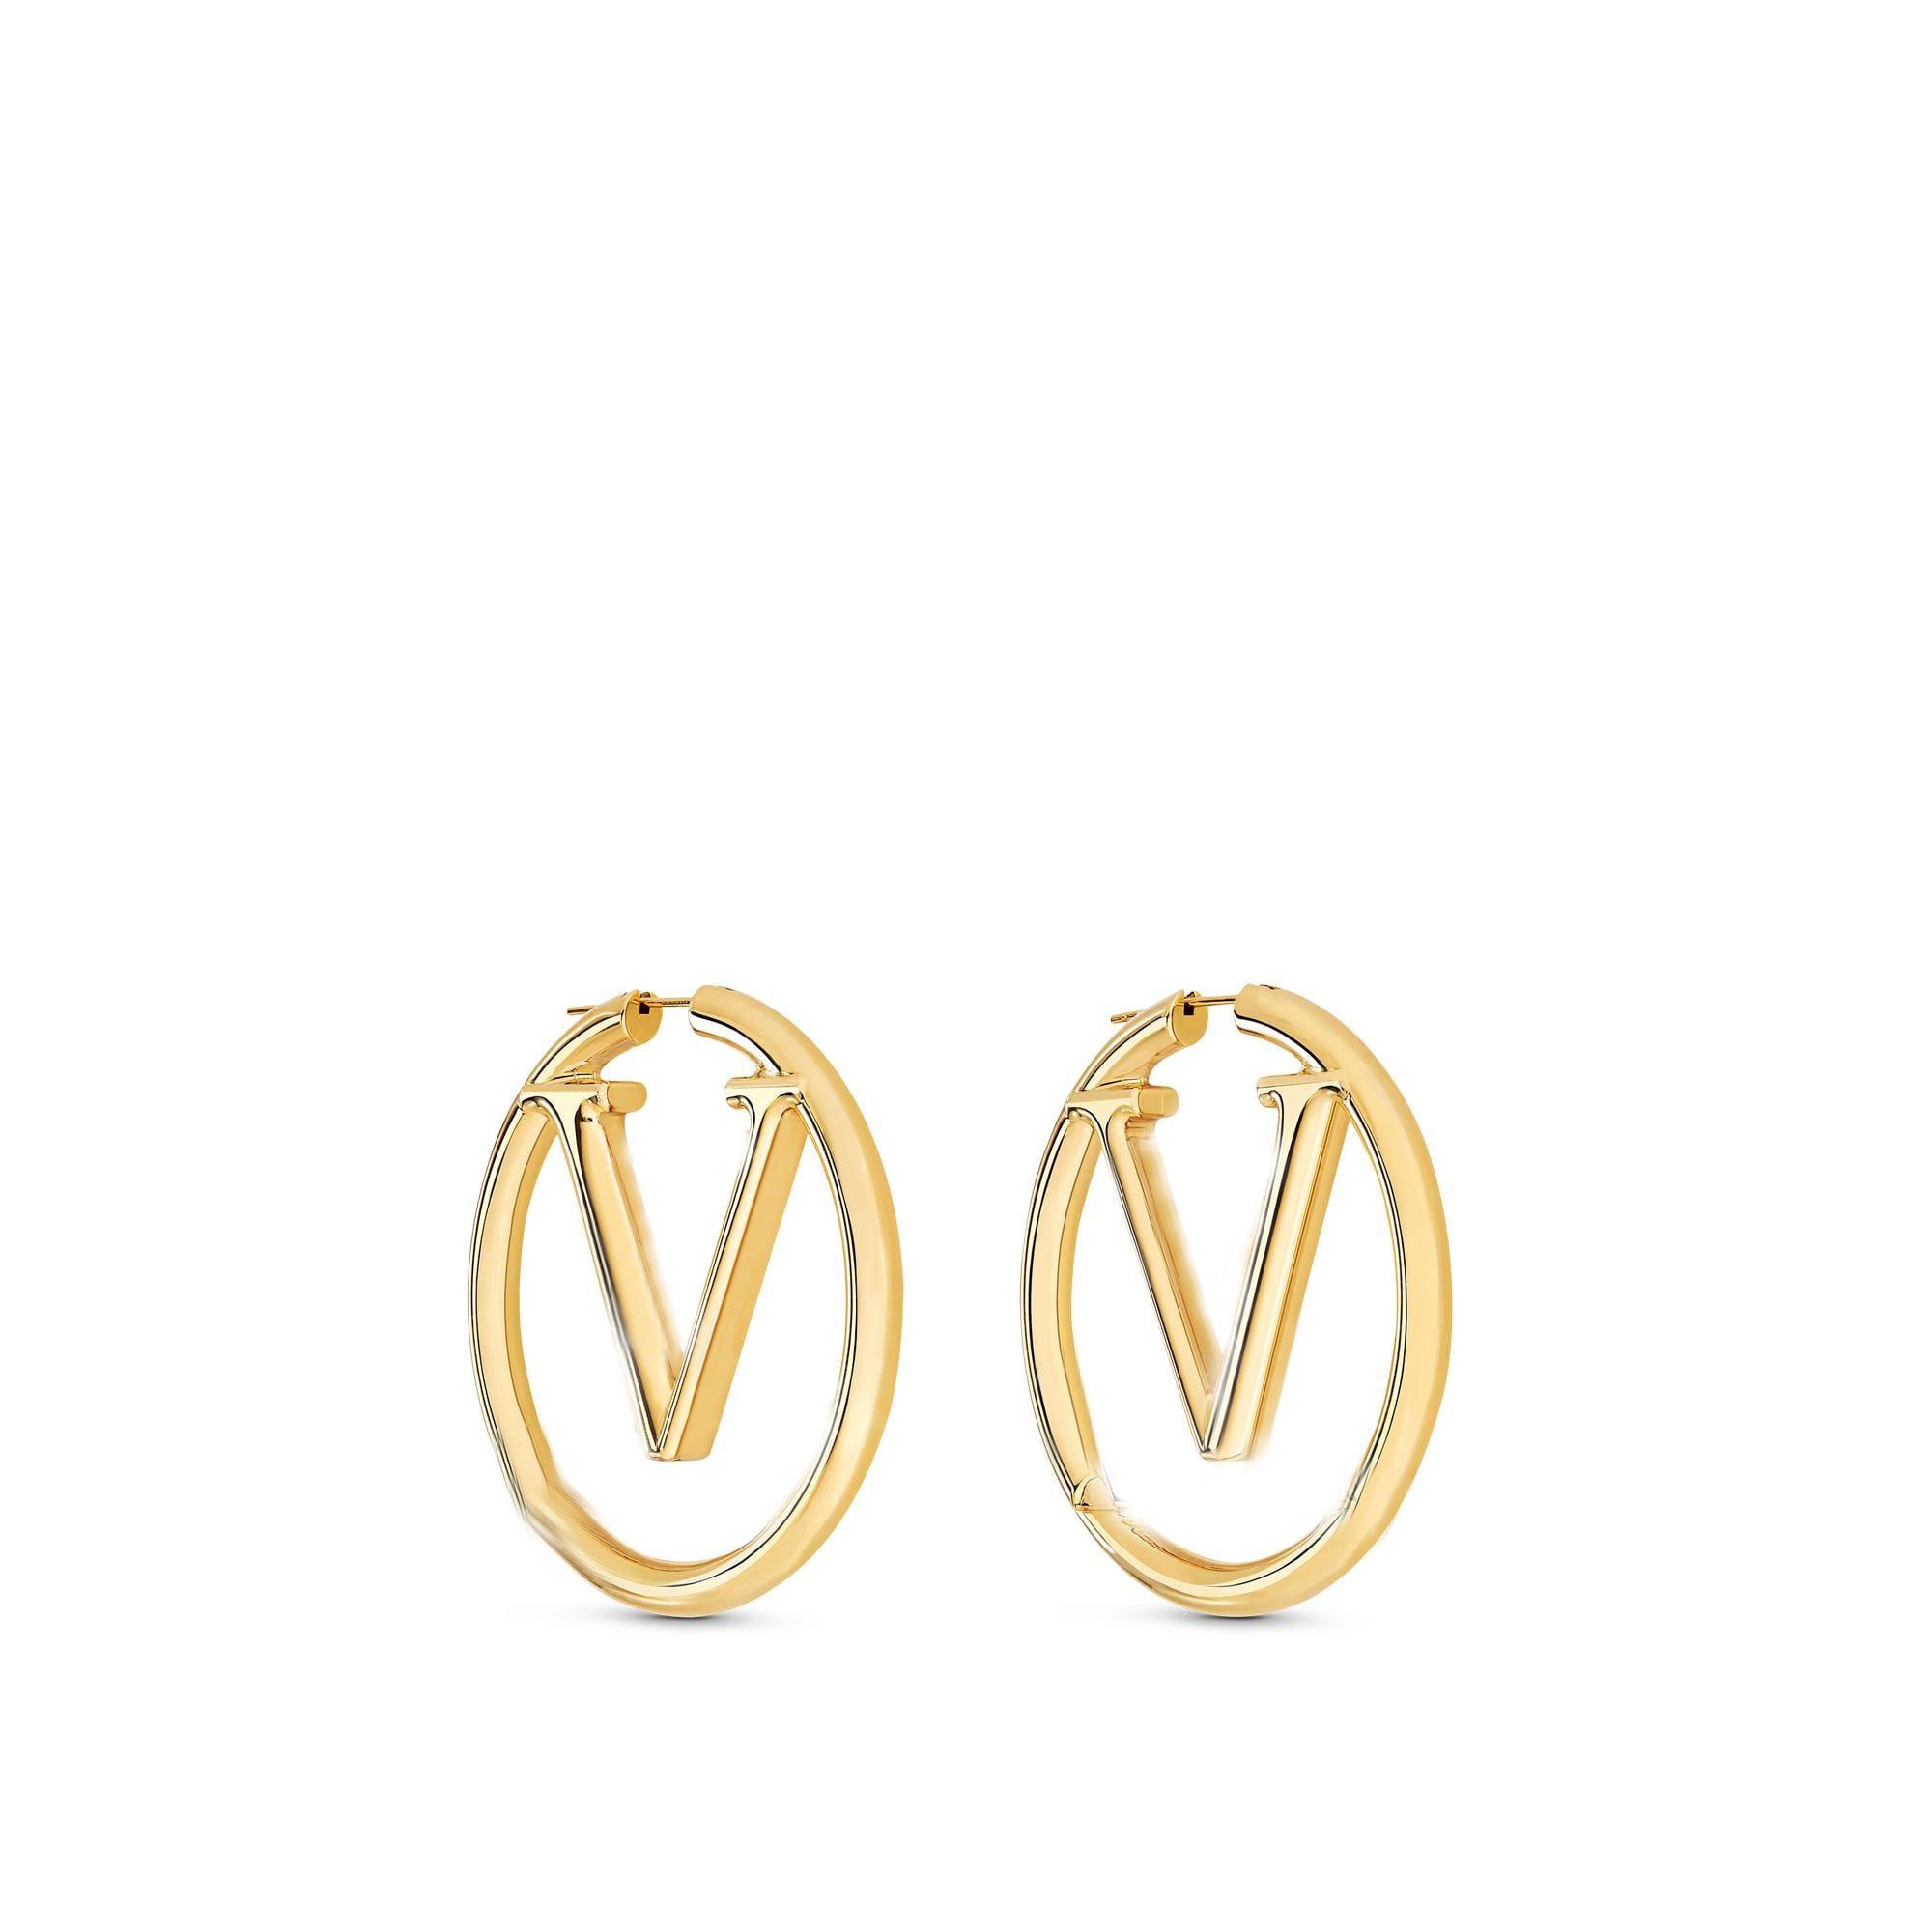 Fashion Earrings Luxurys Designers New Jewelry Womens Fashion Gold Letter Crystal Stuid Earrings Mens With Box D216226F